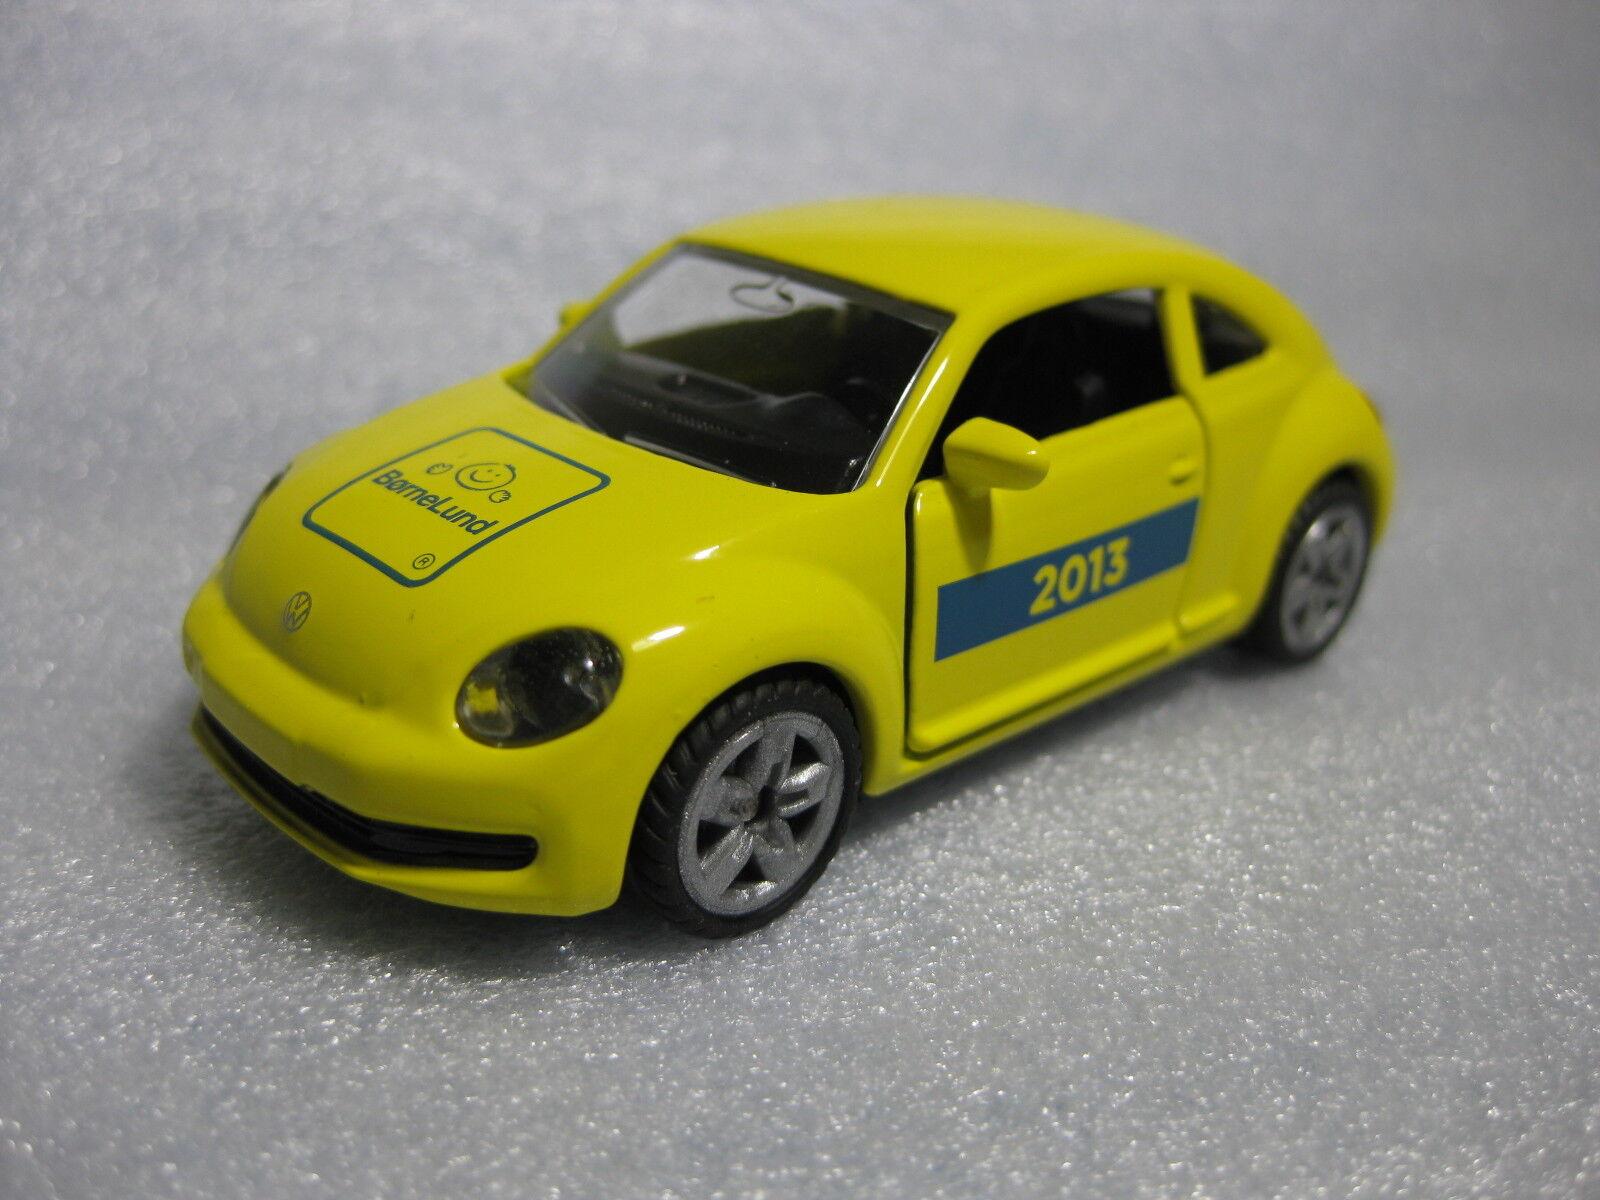 Siku VW El Escarabajo bornelund 2013 exclusivo Diecast Modelo RARE PROMO